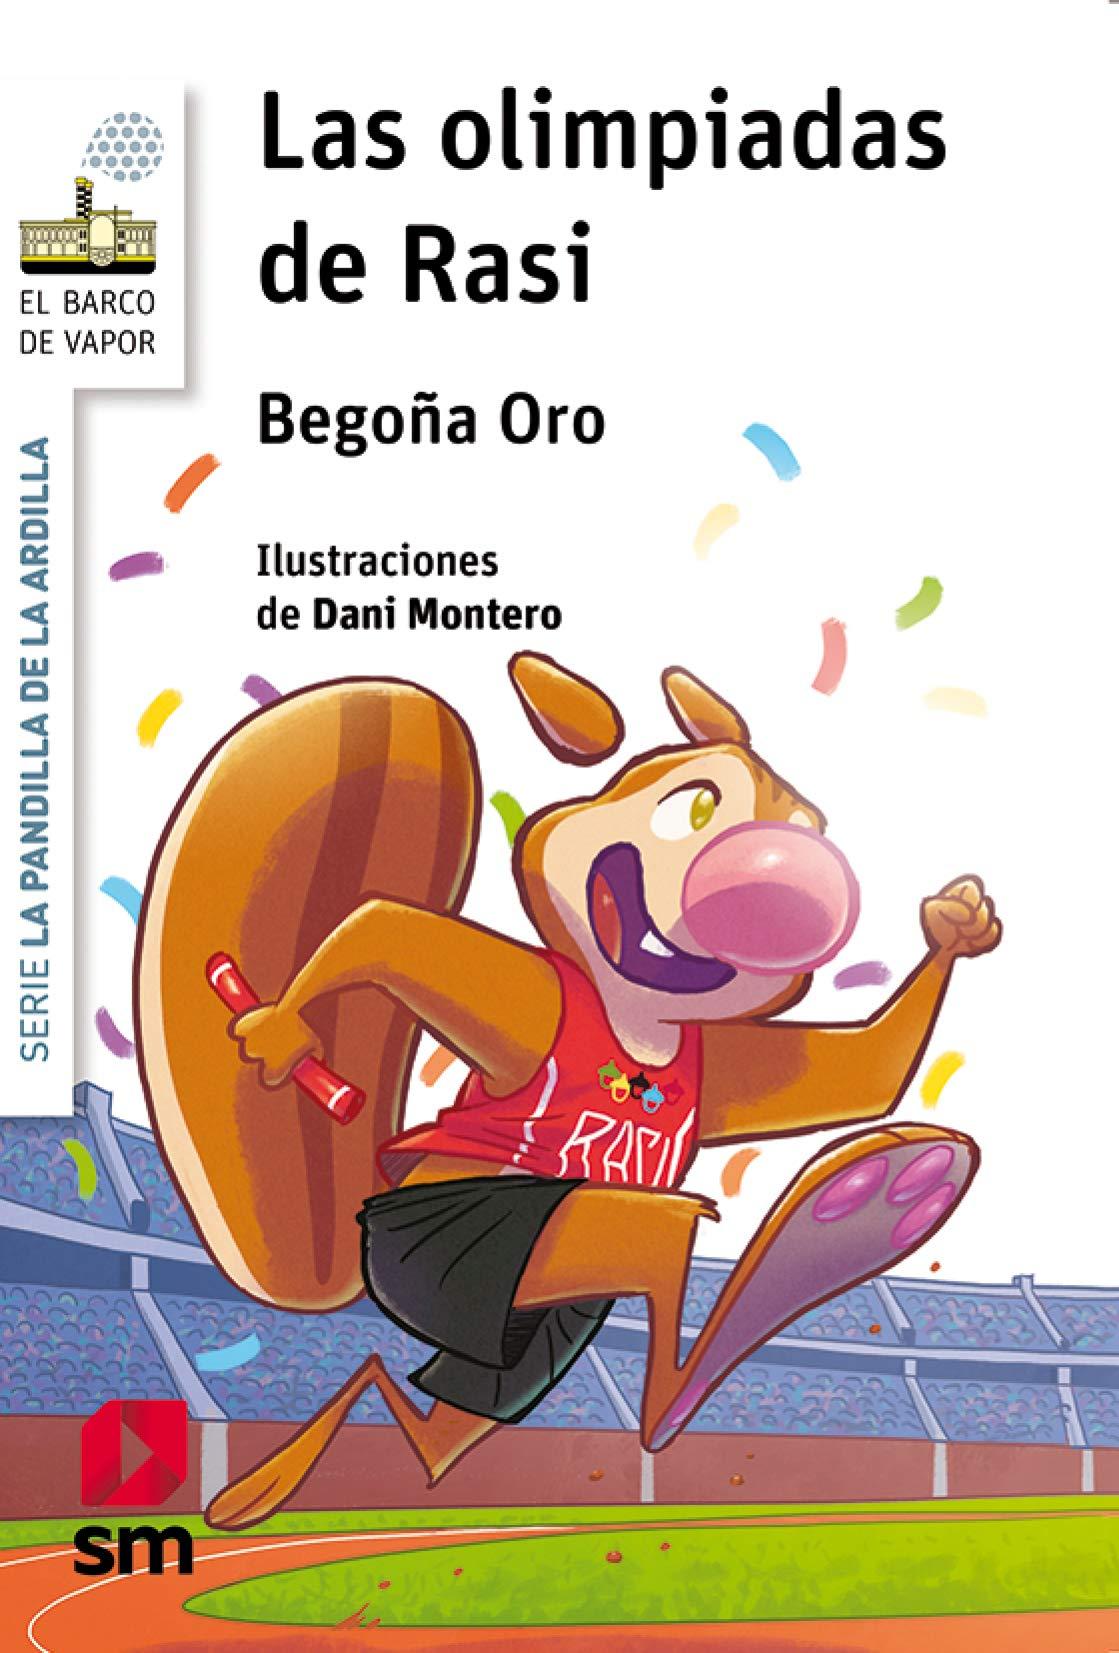 Las olimpiadas de Rasi: BVBPA.18 Las olimpiadas de Rasi El Barco ...